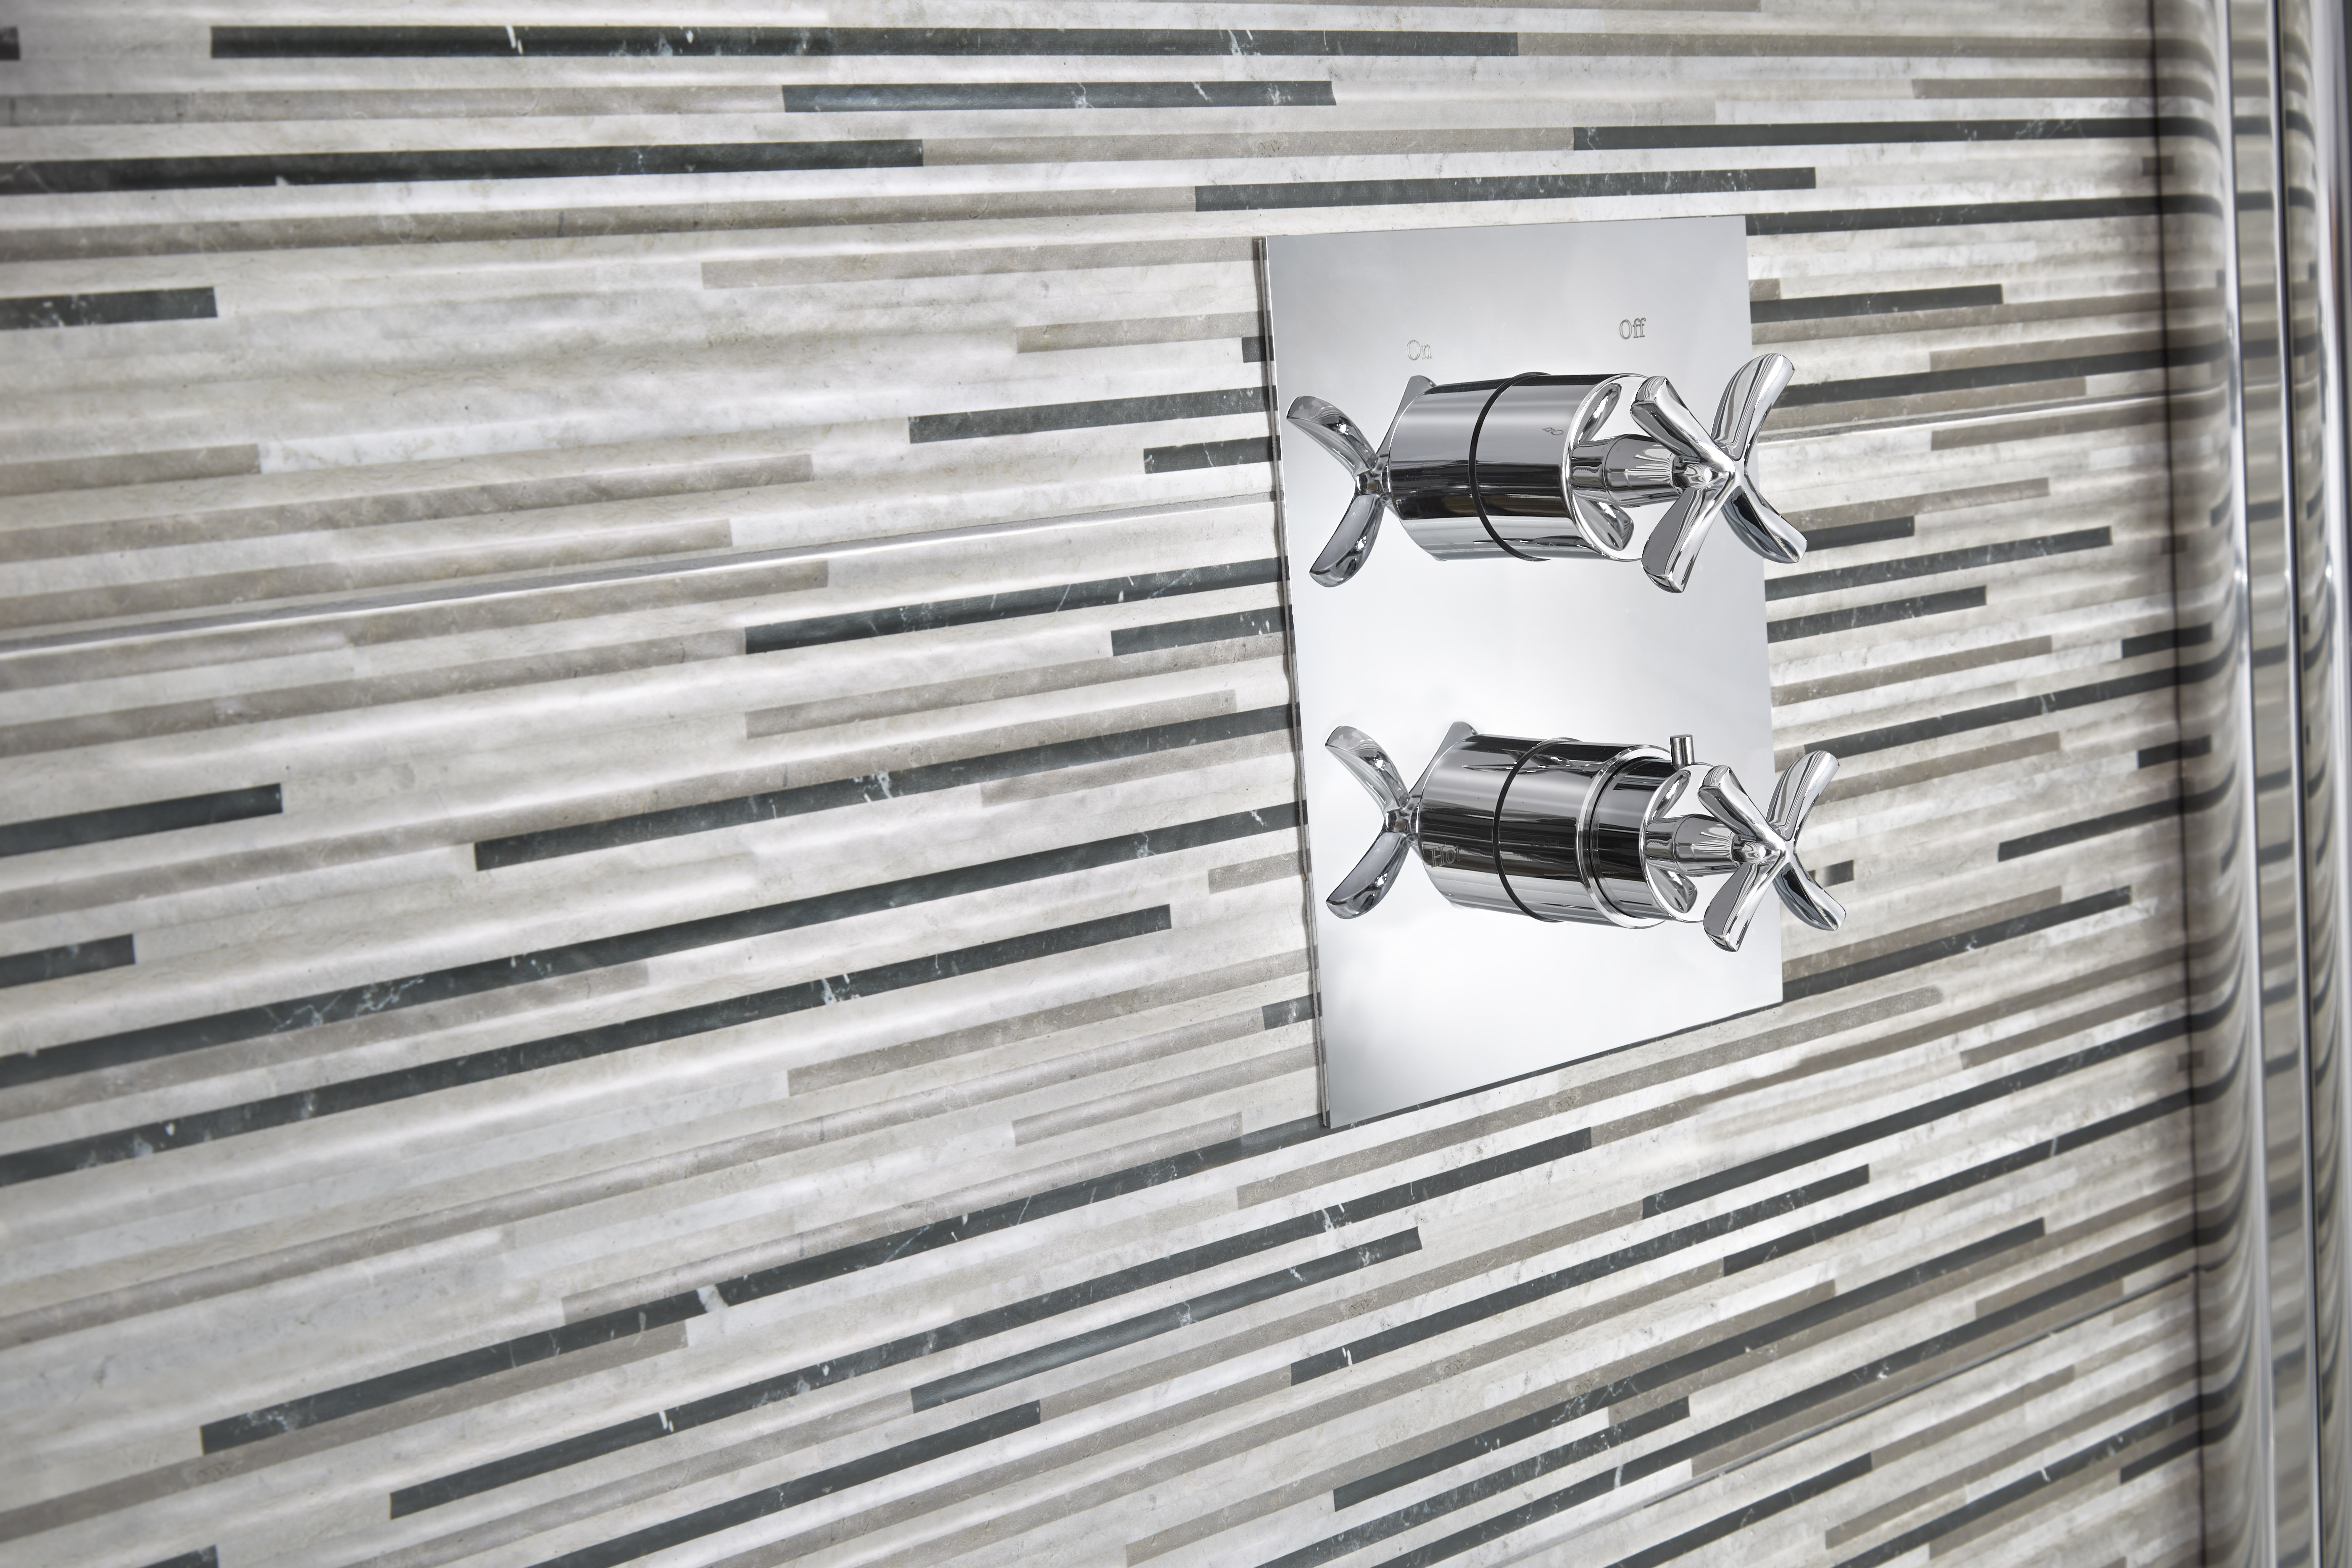 Bathroom Design Supply Westhoughton : Gallery bathroom design and supply fitted bathrooms